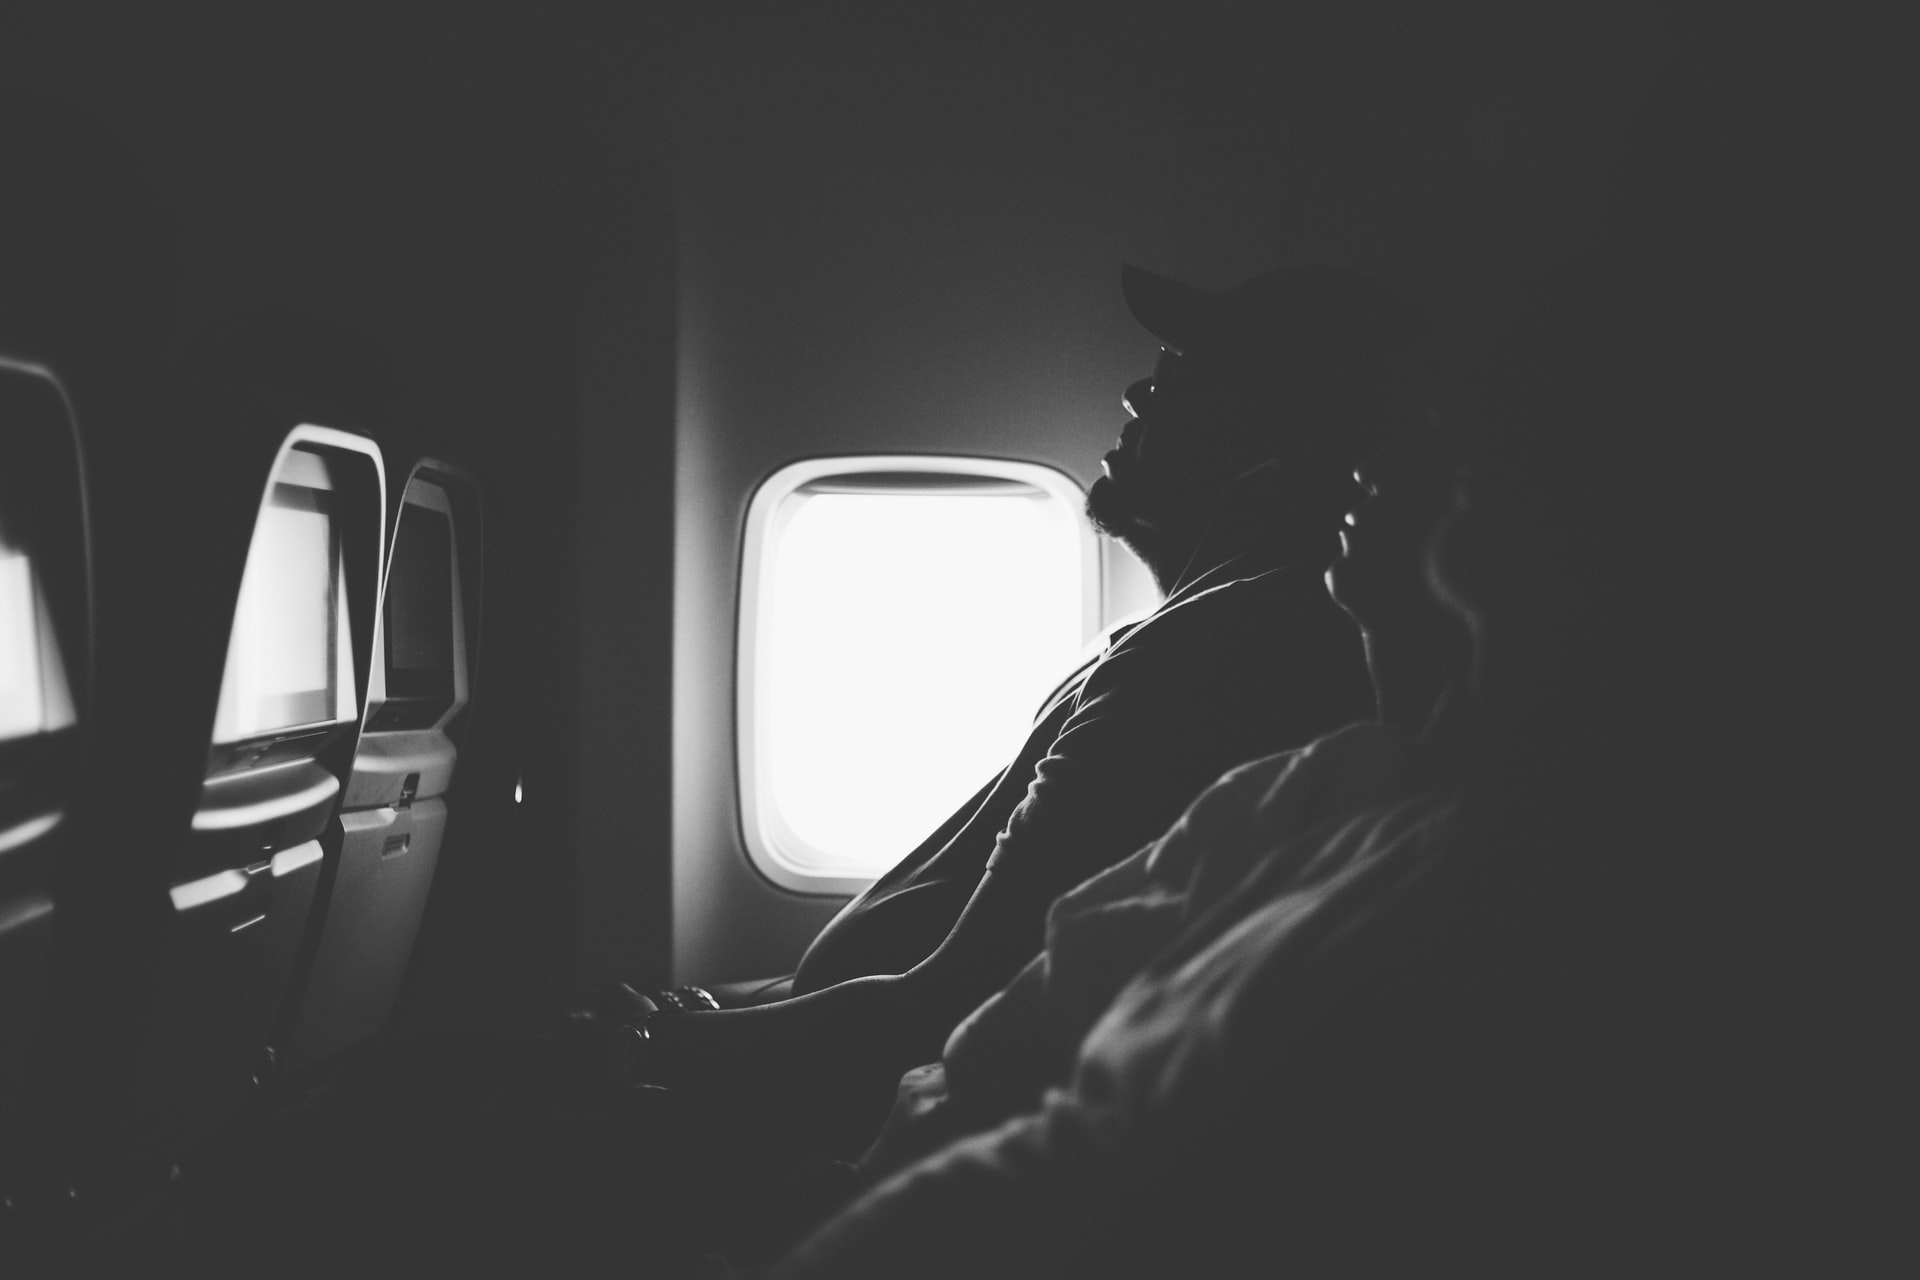 Ilustrasi tidur di pesawat. Photo by Annie Theby on Unsplash